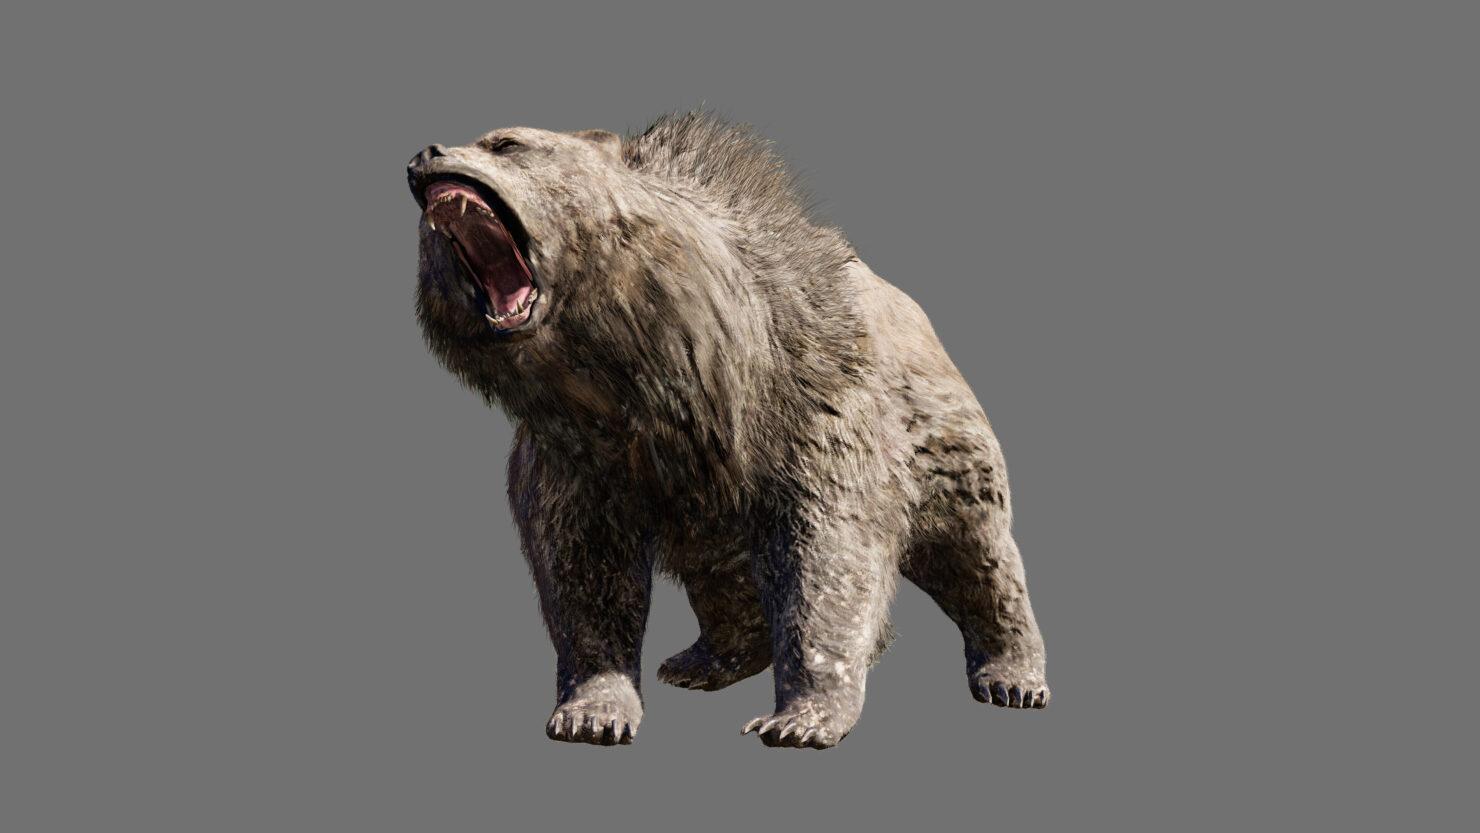 fcp_render_cave_bear_beastmaster_reveal_151204_5am_cet_1449251219